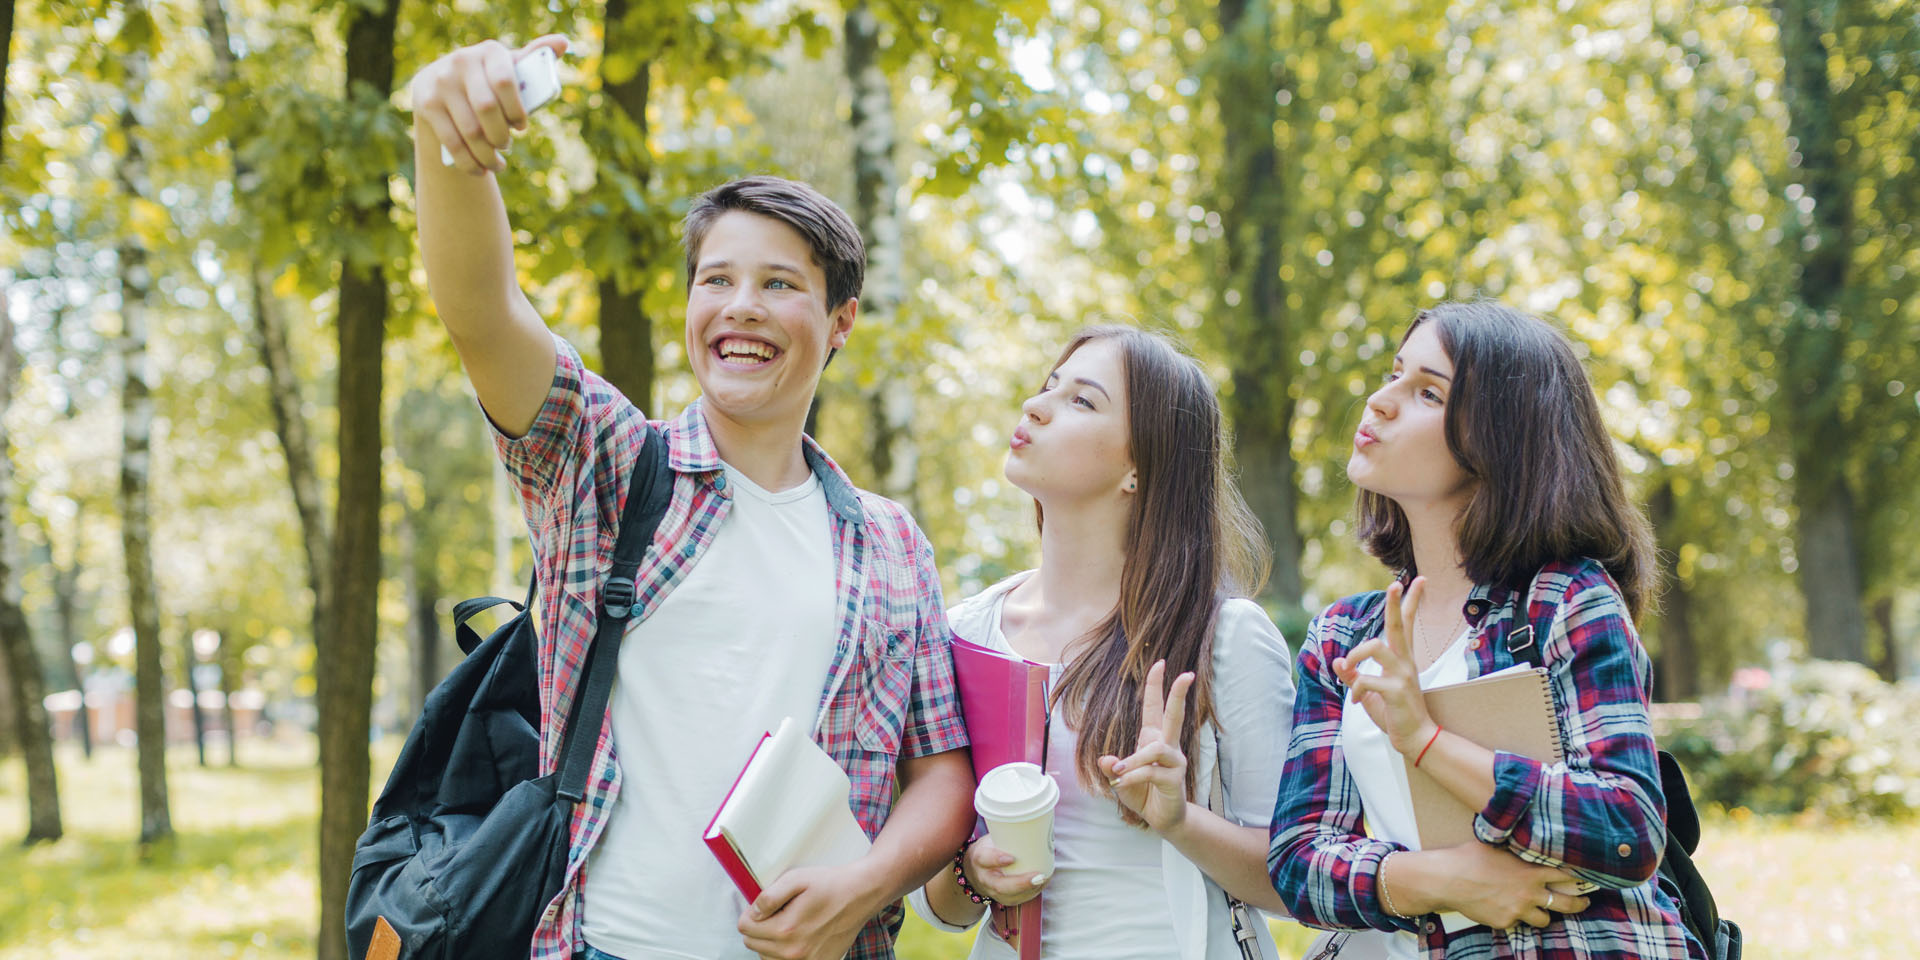 Students taking selfie. ibtutors.eu. Designed by Freepik.